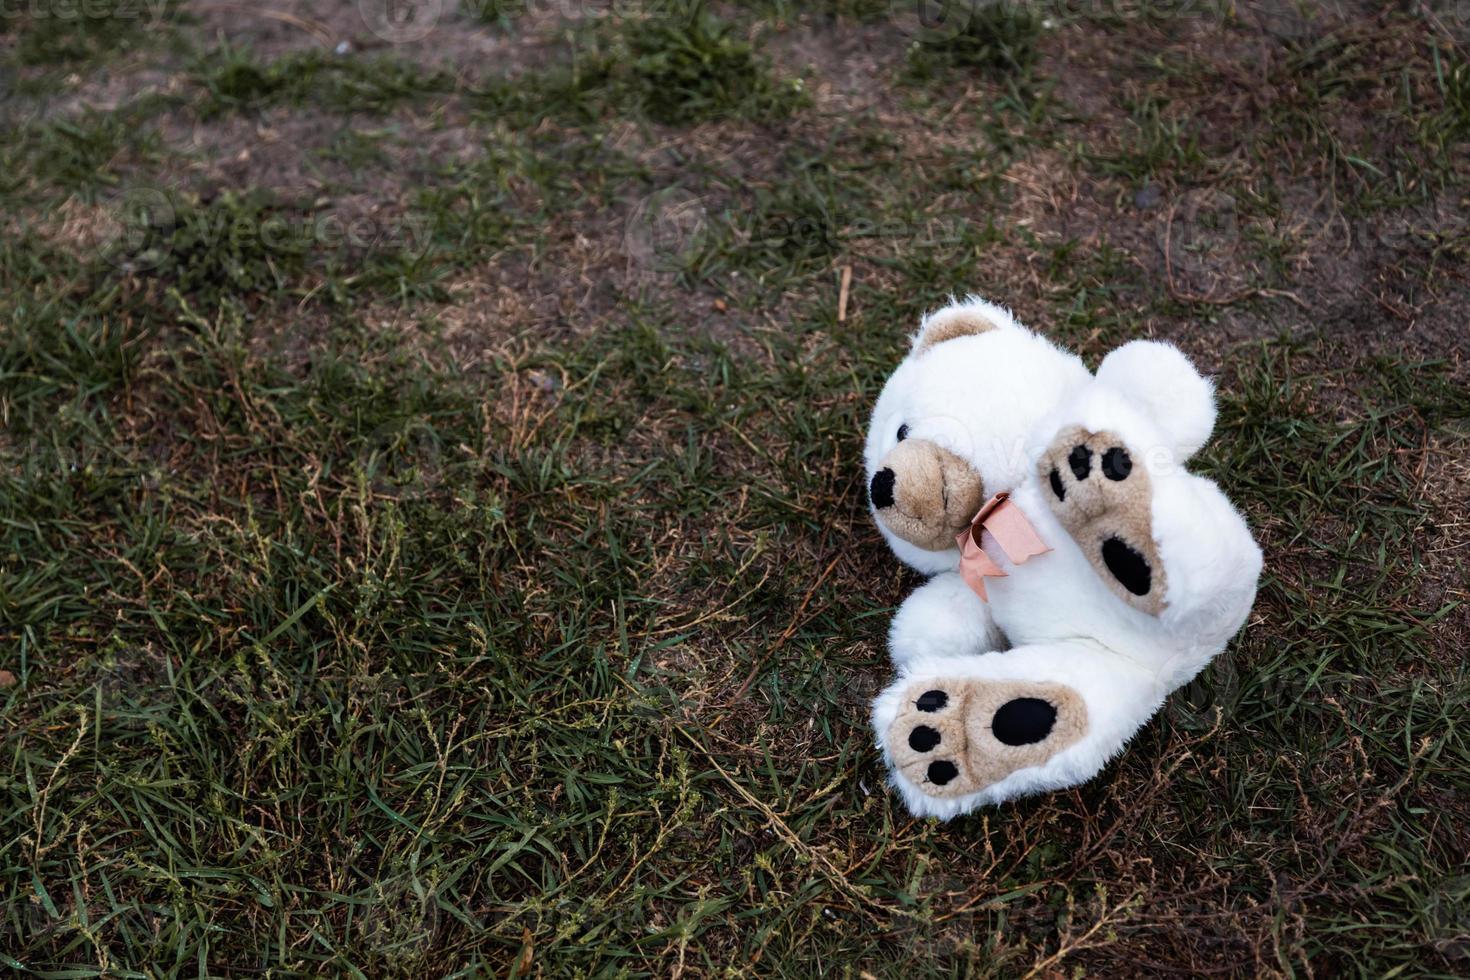 Lost abandoned soft plush toy teddy bear sitting on ground photo